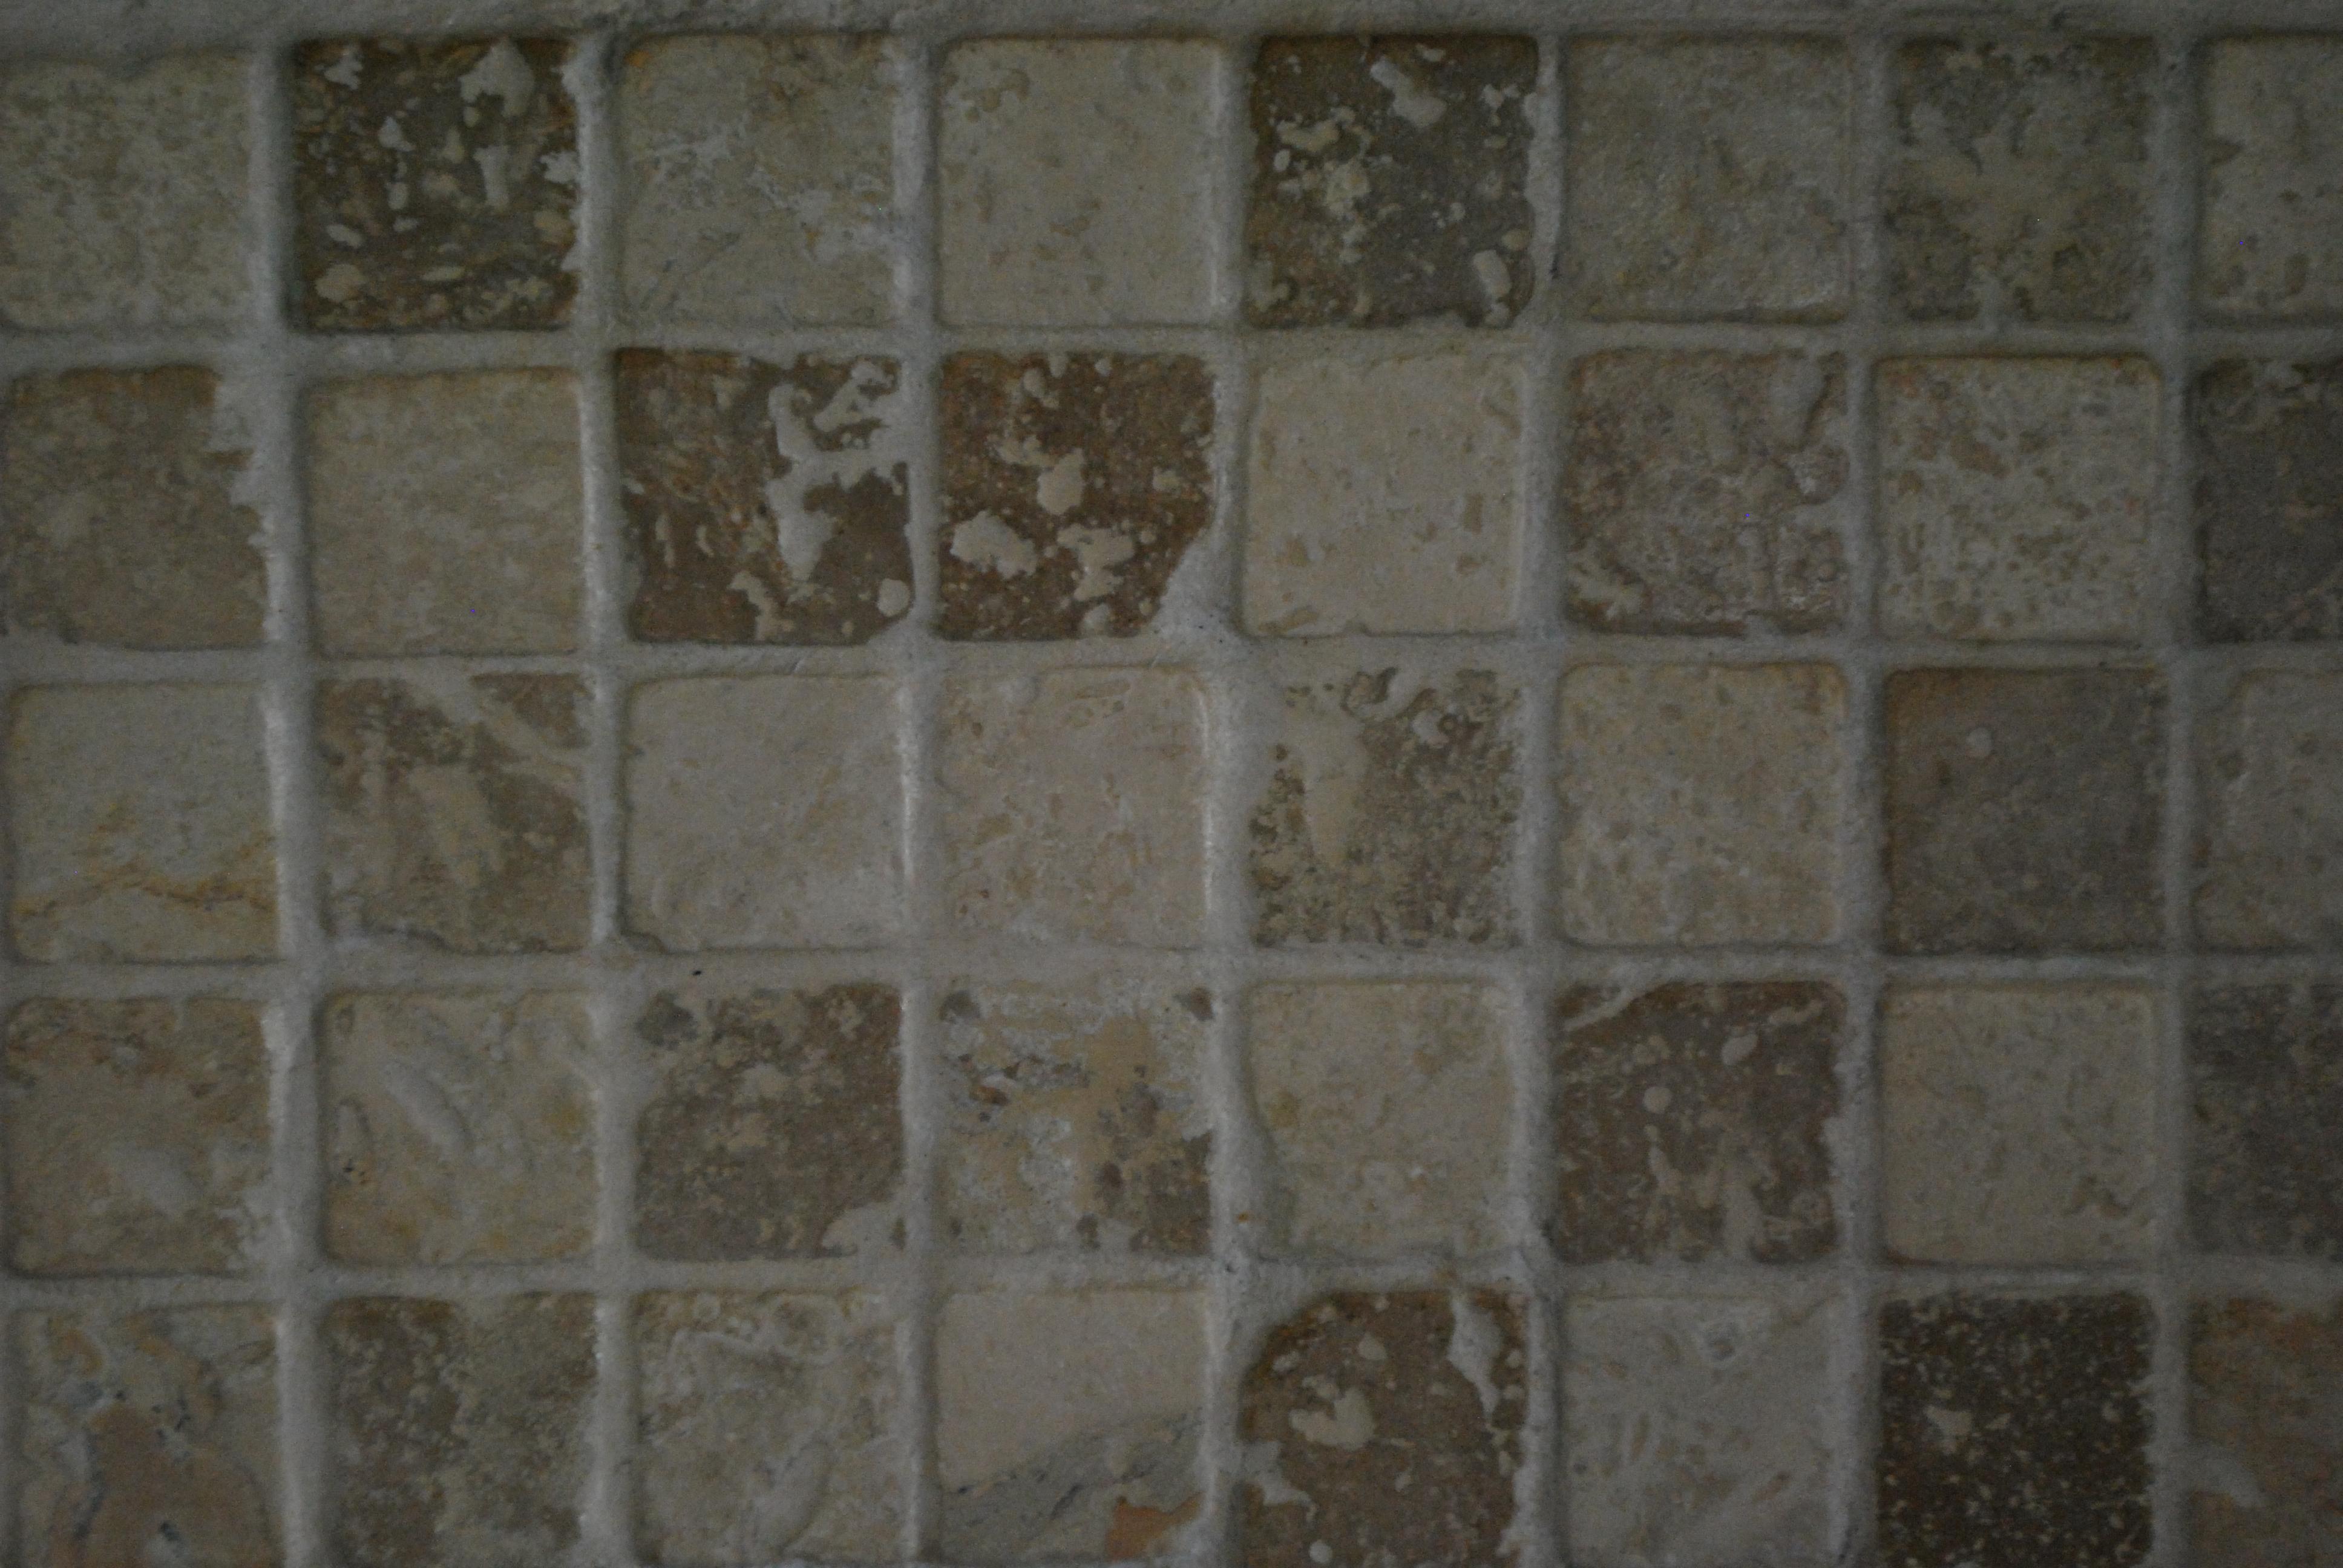 File:Mosaic tiled wall.JPG - Wikimedia Commons